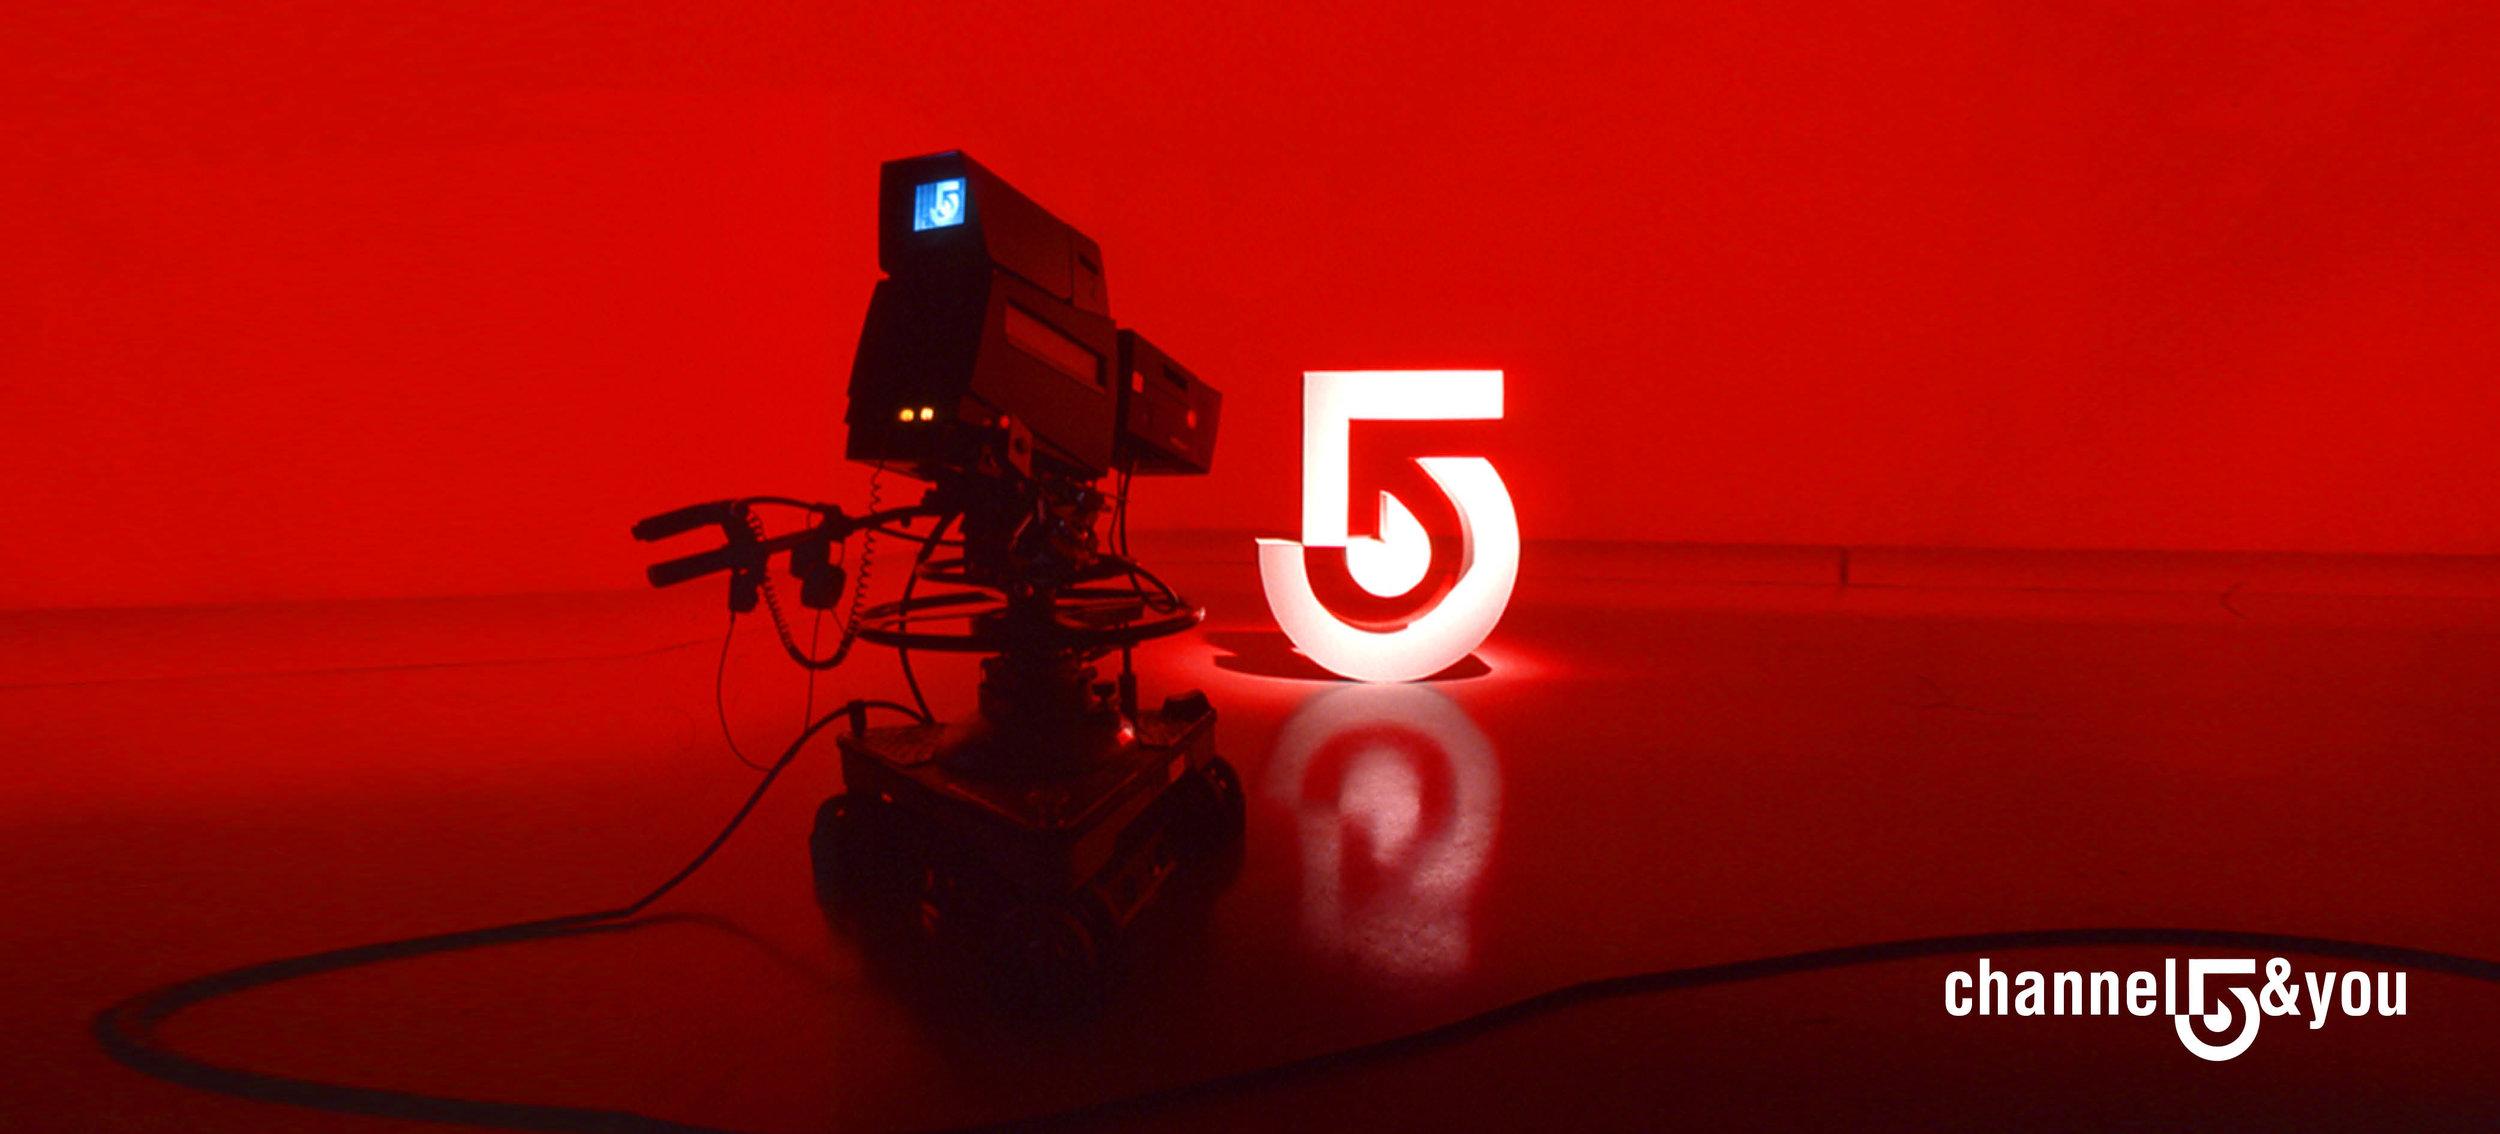 Channel 5 new frames.jpg